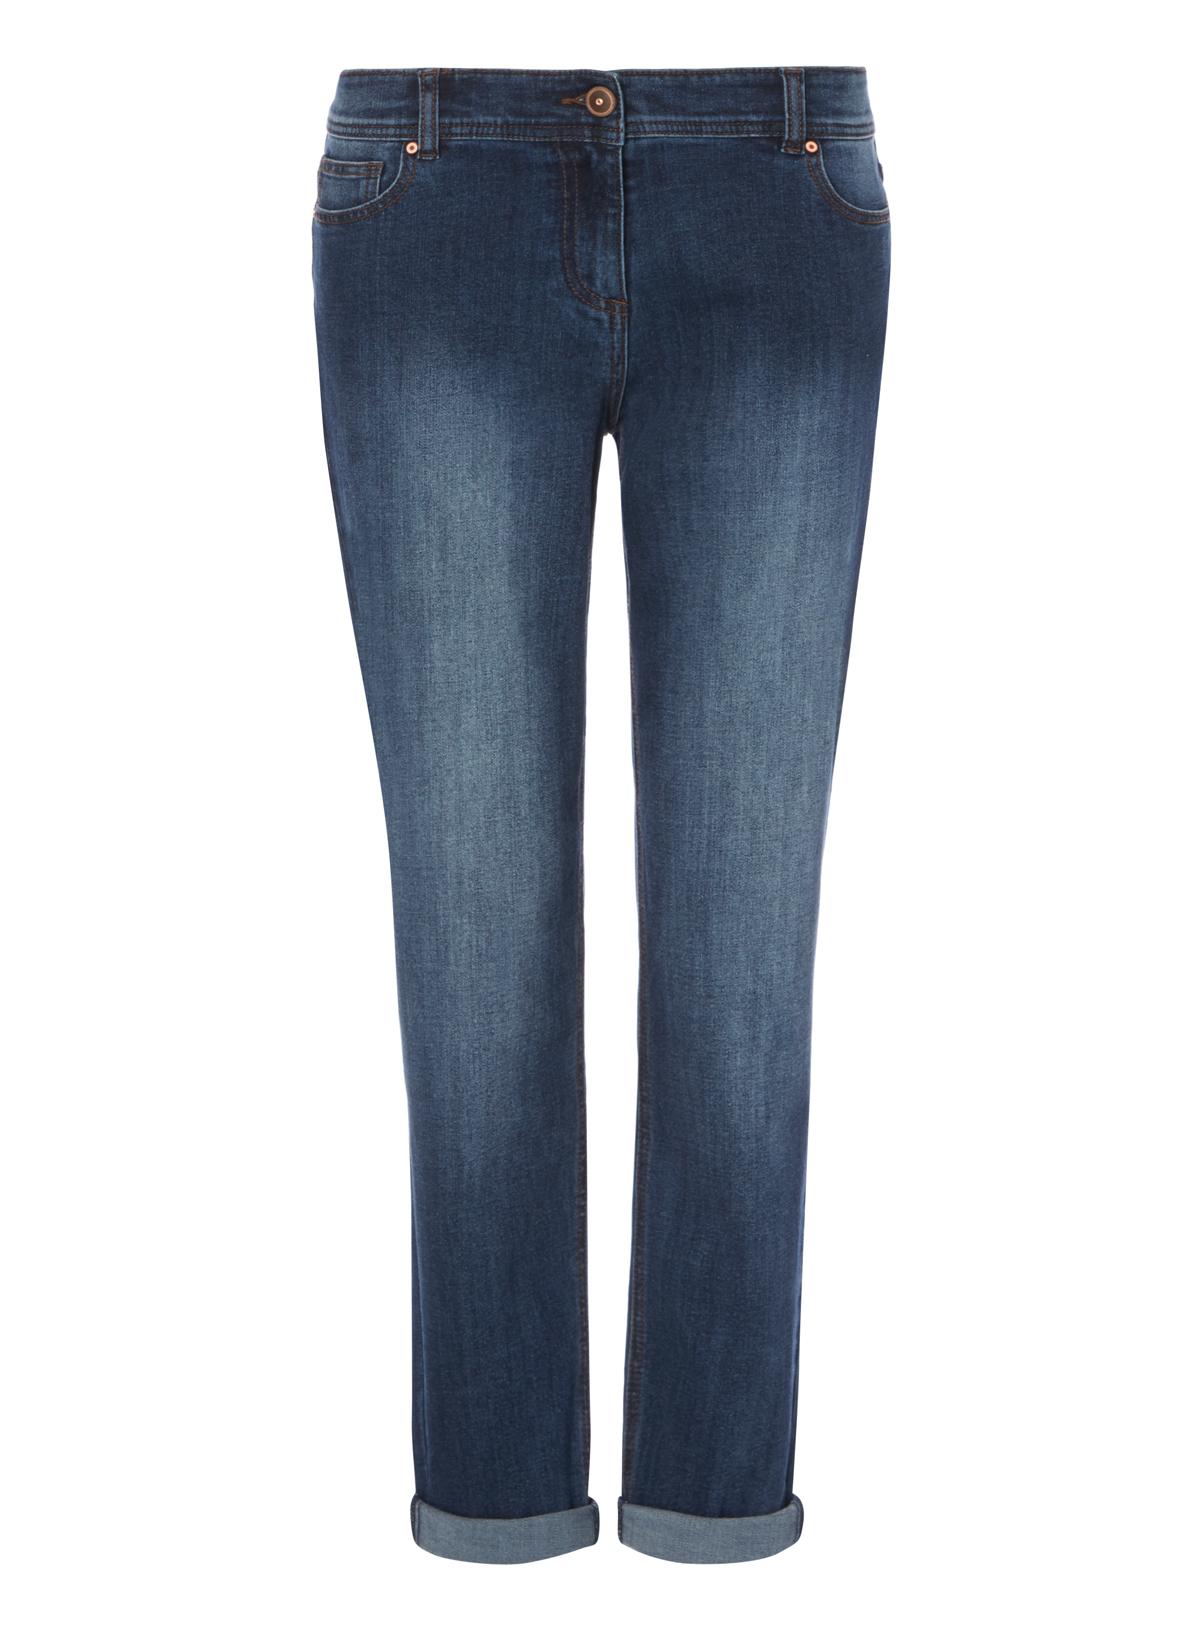 Womens Dark Denim Boyfriend Jeans | Tu clothing